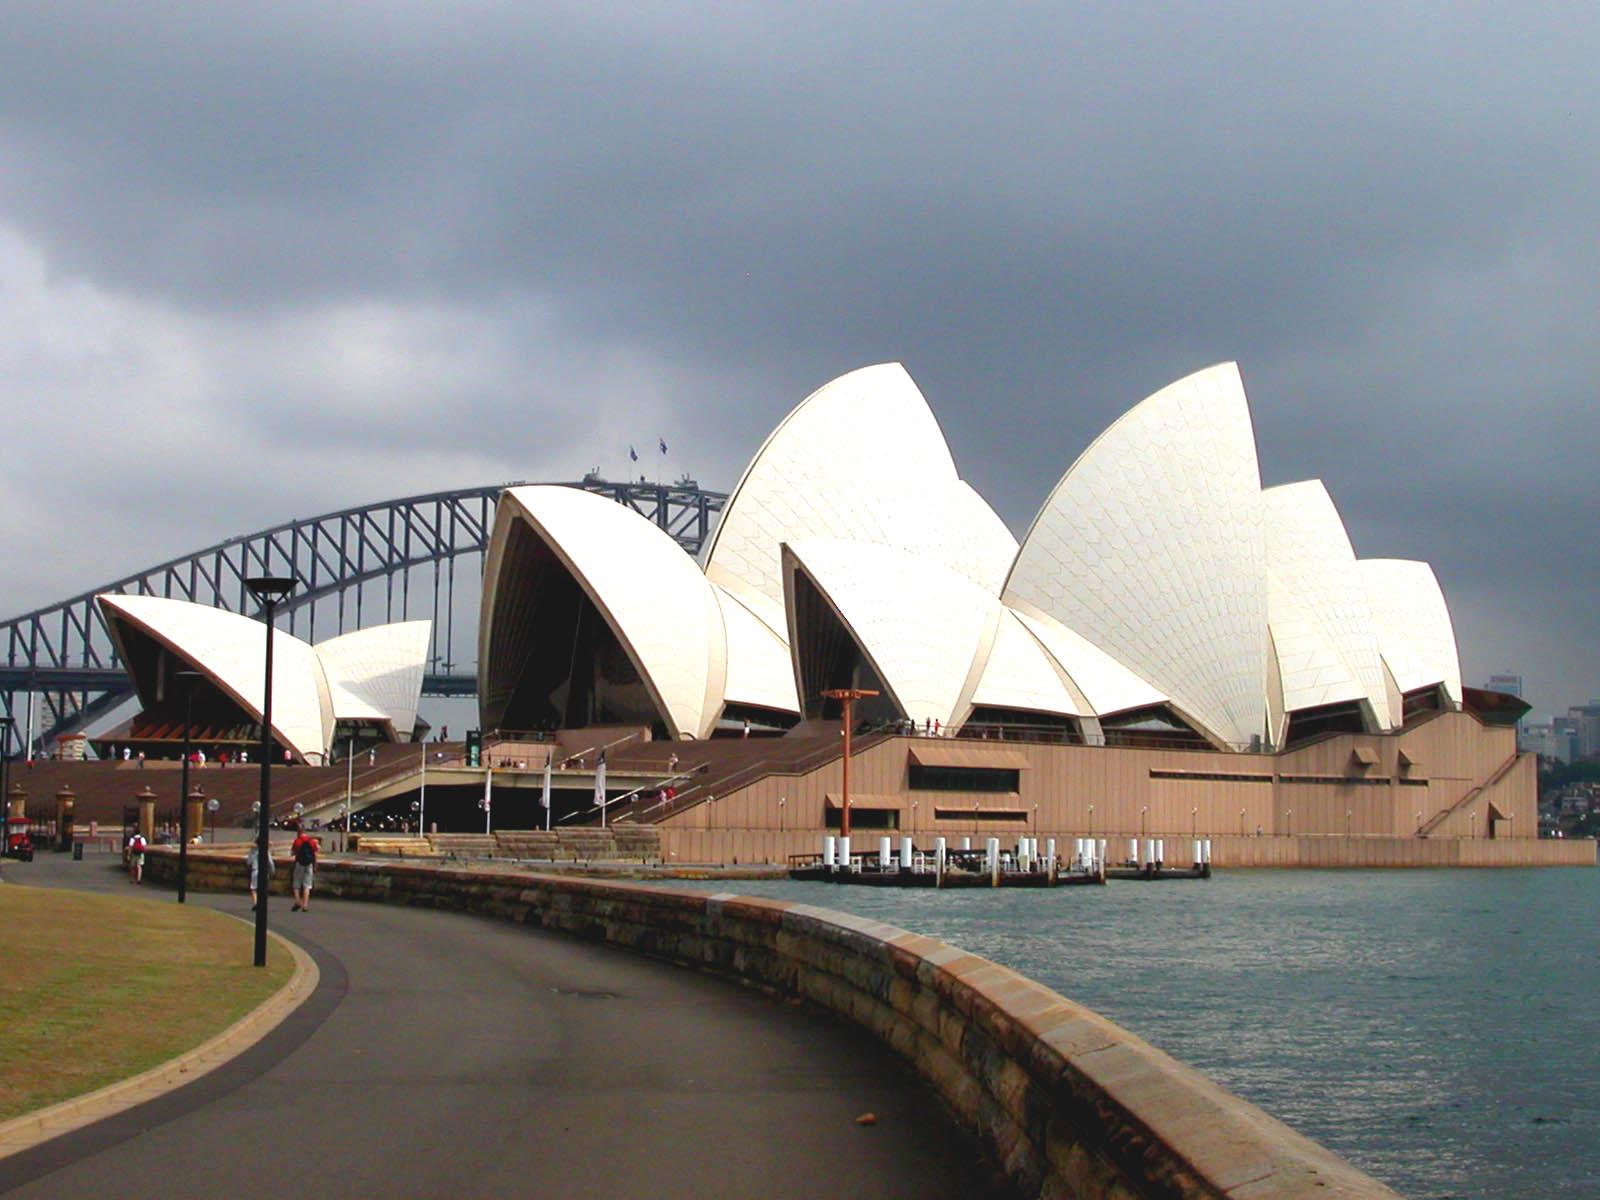 House Design Companies Australia World Visits Sydney Opera House Popular Destinations In